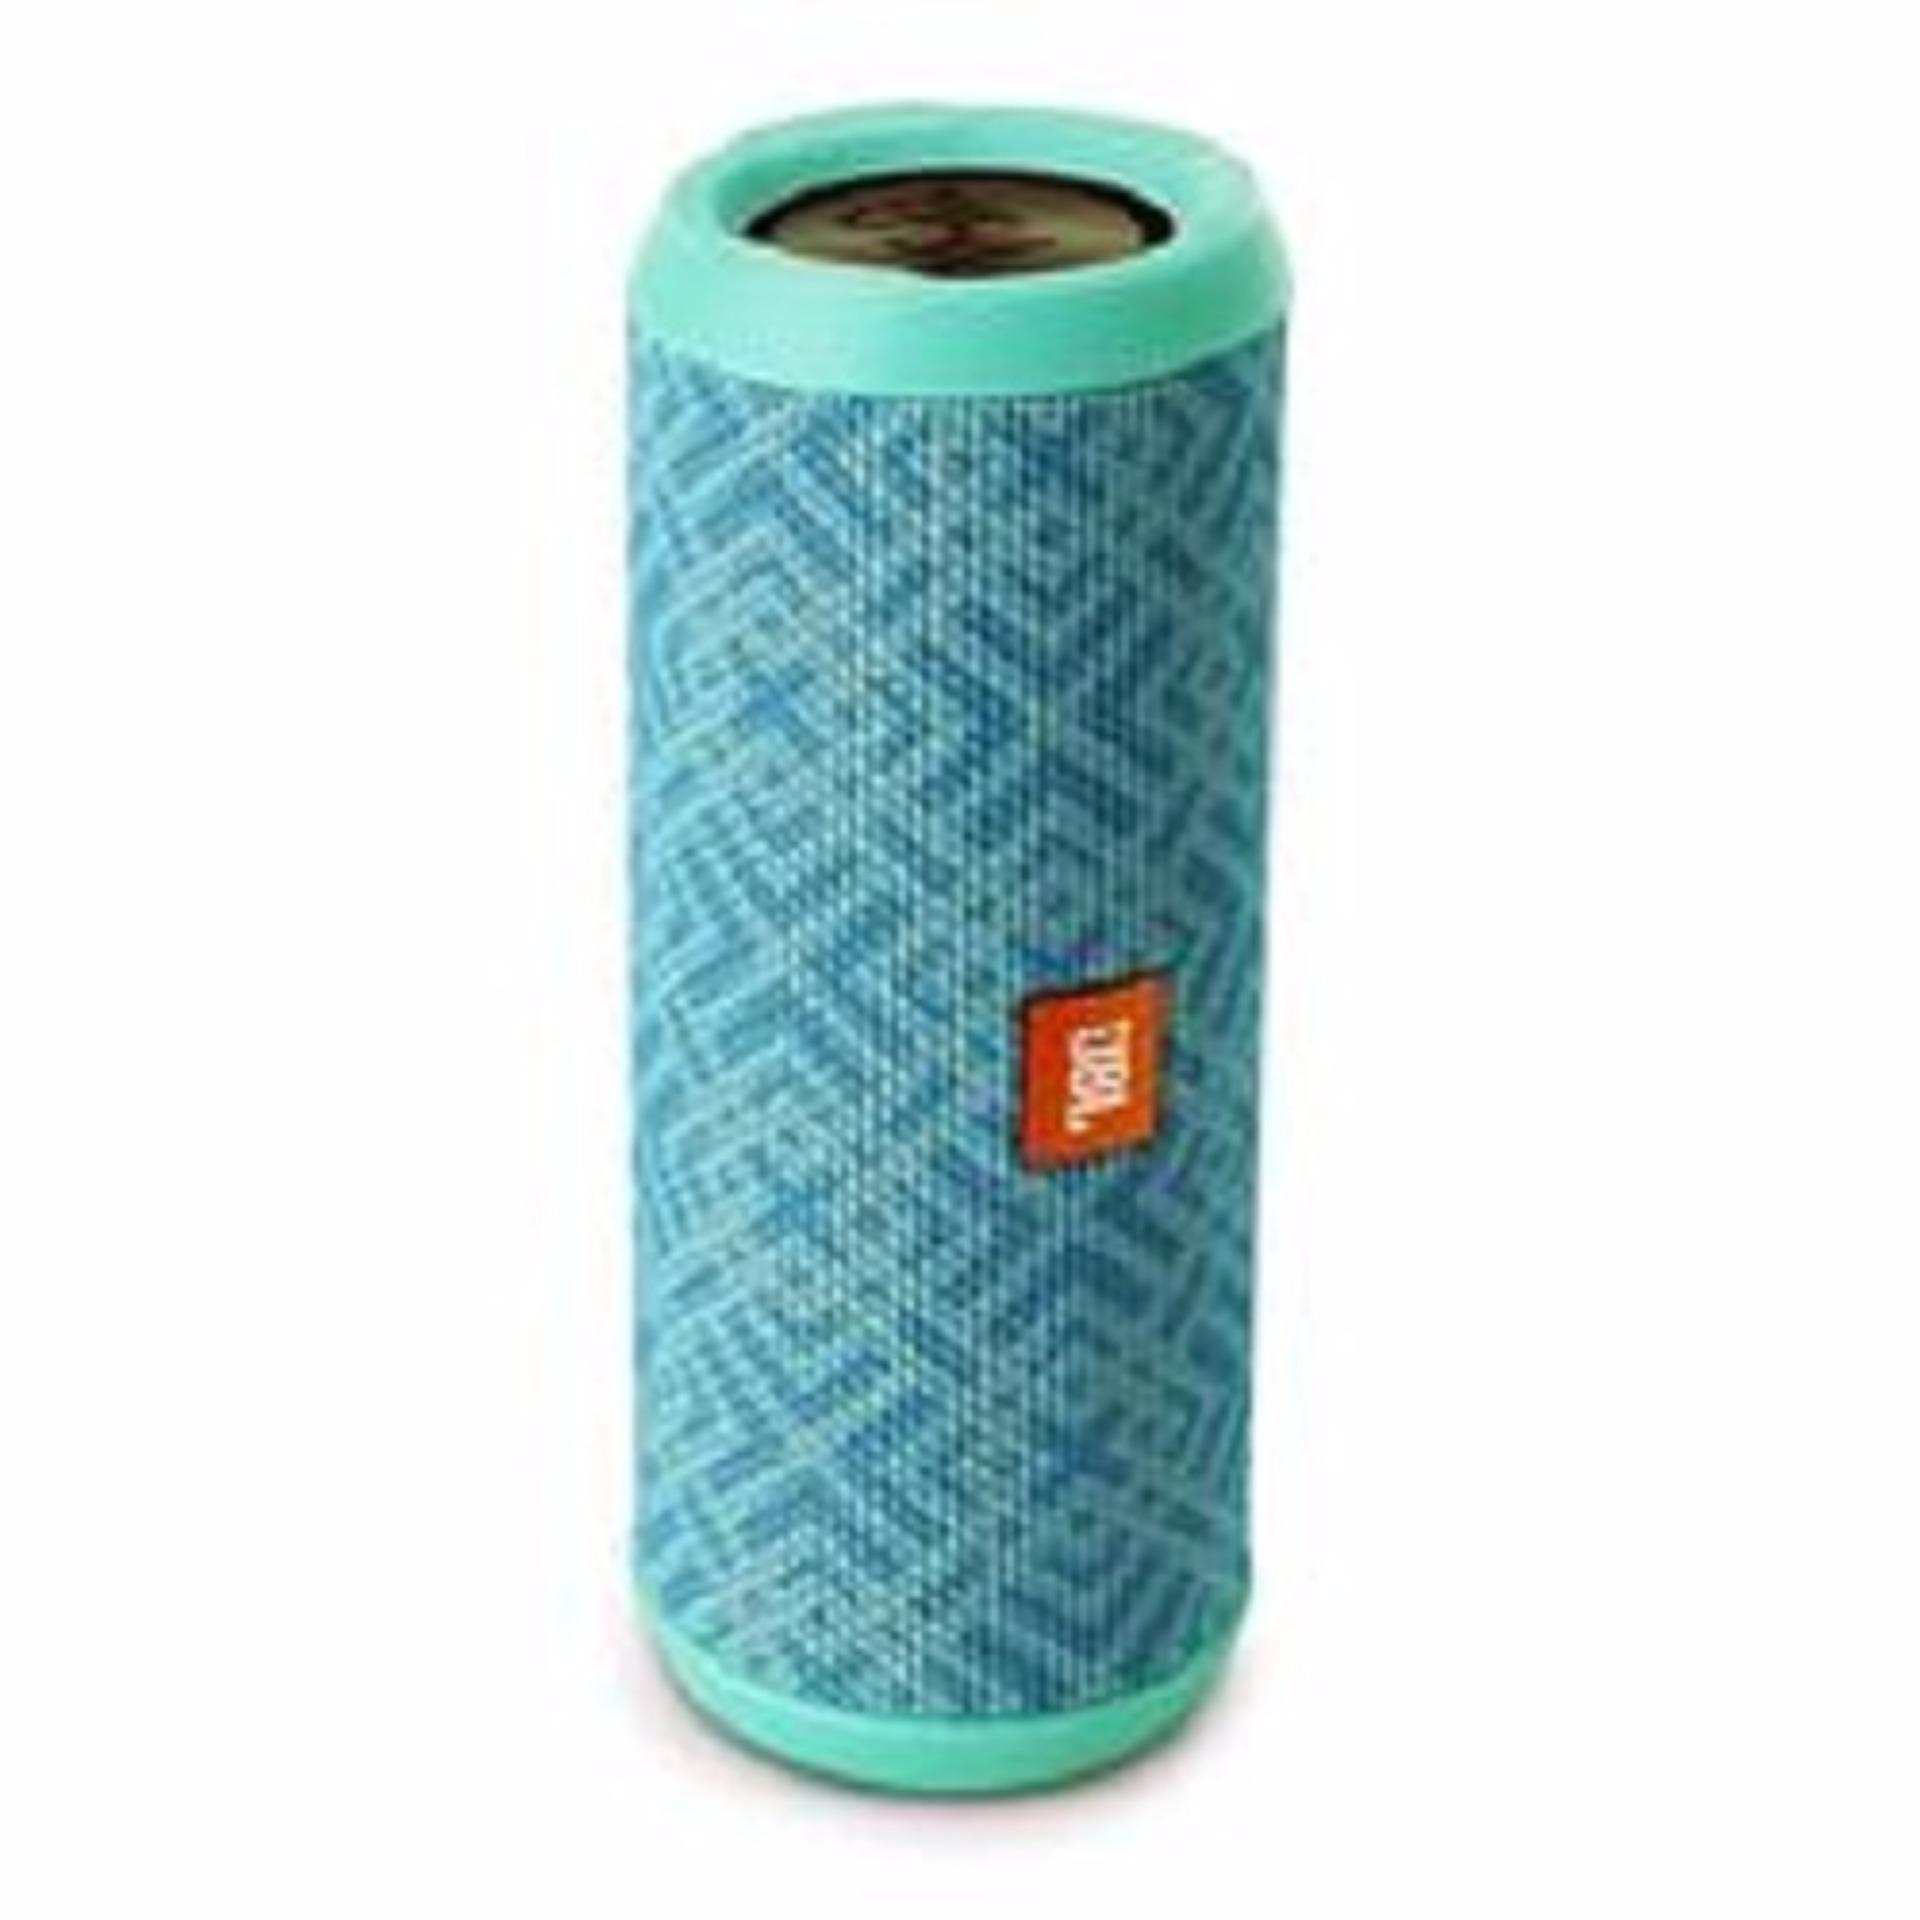 jbl flip 3 bluetooth speaker. Harman JBL Flip 3 Mosaic Splash Proof Portable Bluetooth Speaker (Teal) | Lazada PH Jbl